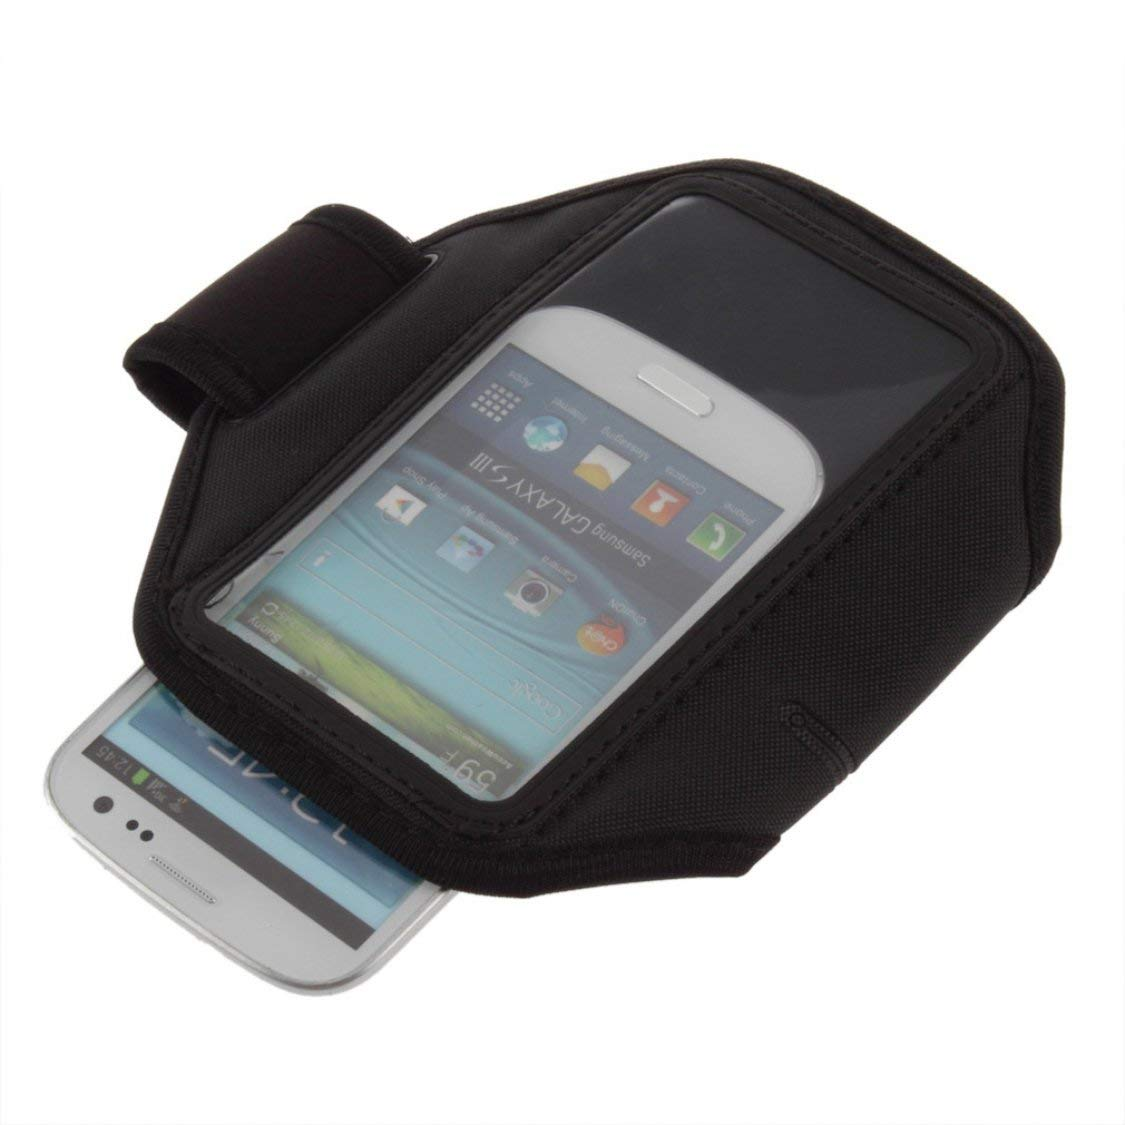 Ajustable Negro Deporte Gimnasio Correr Brazalete Cubierta de la Caja para Samsung Galaxy s3 i9300 t999 tel/éfono m/óvil cintur/ón Cubierta Caliente